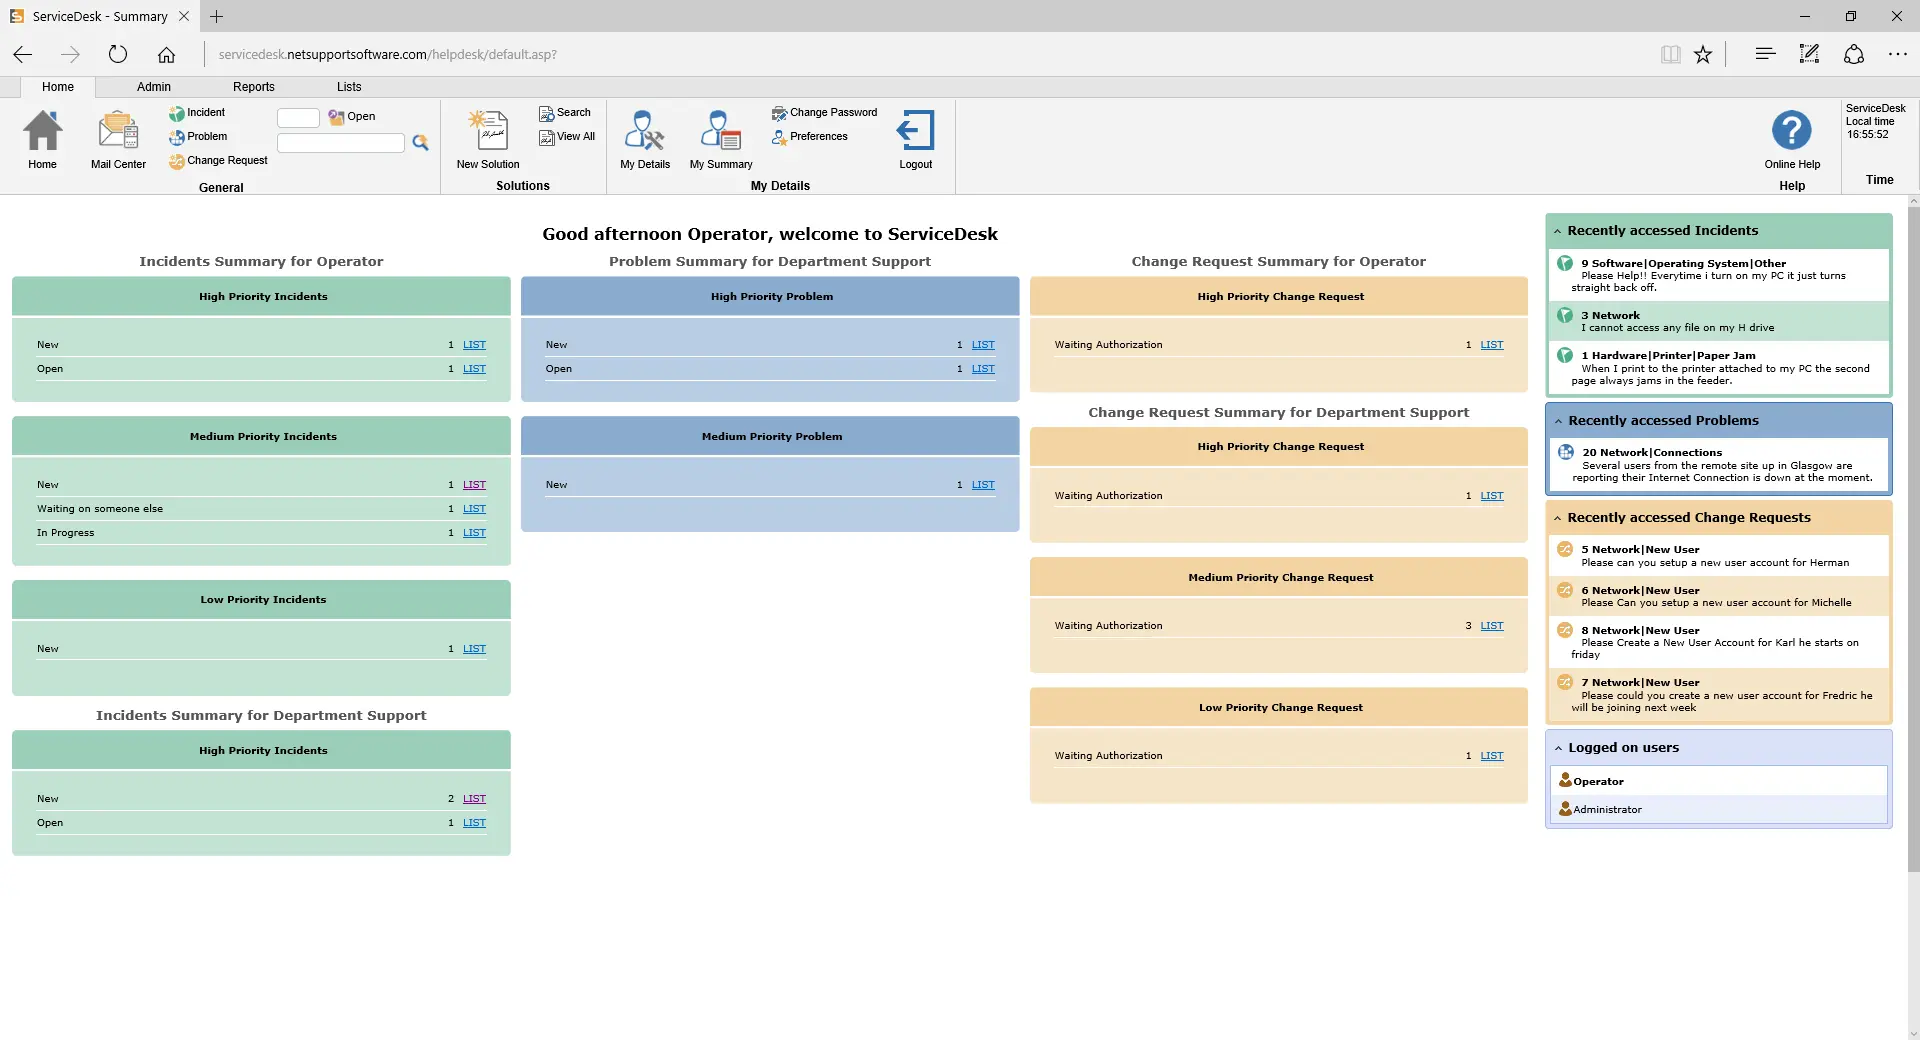 NetSupport ServiceDesk helpdesk activity view